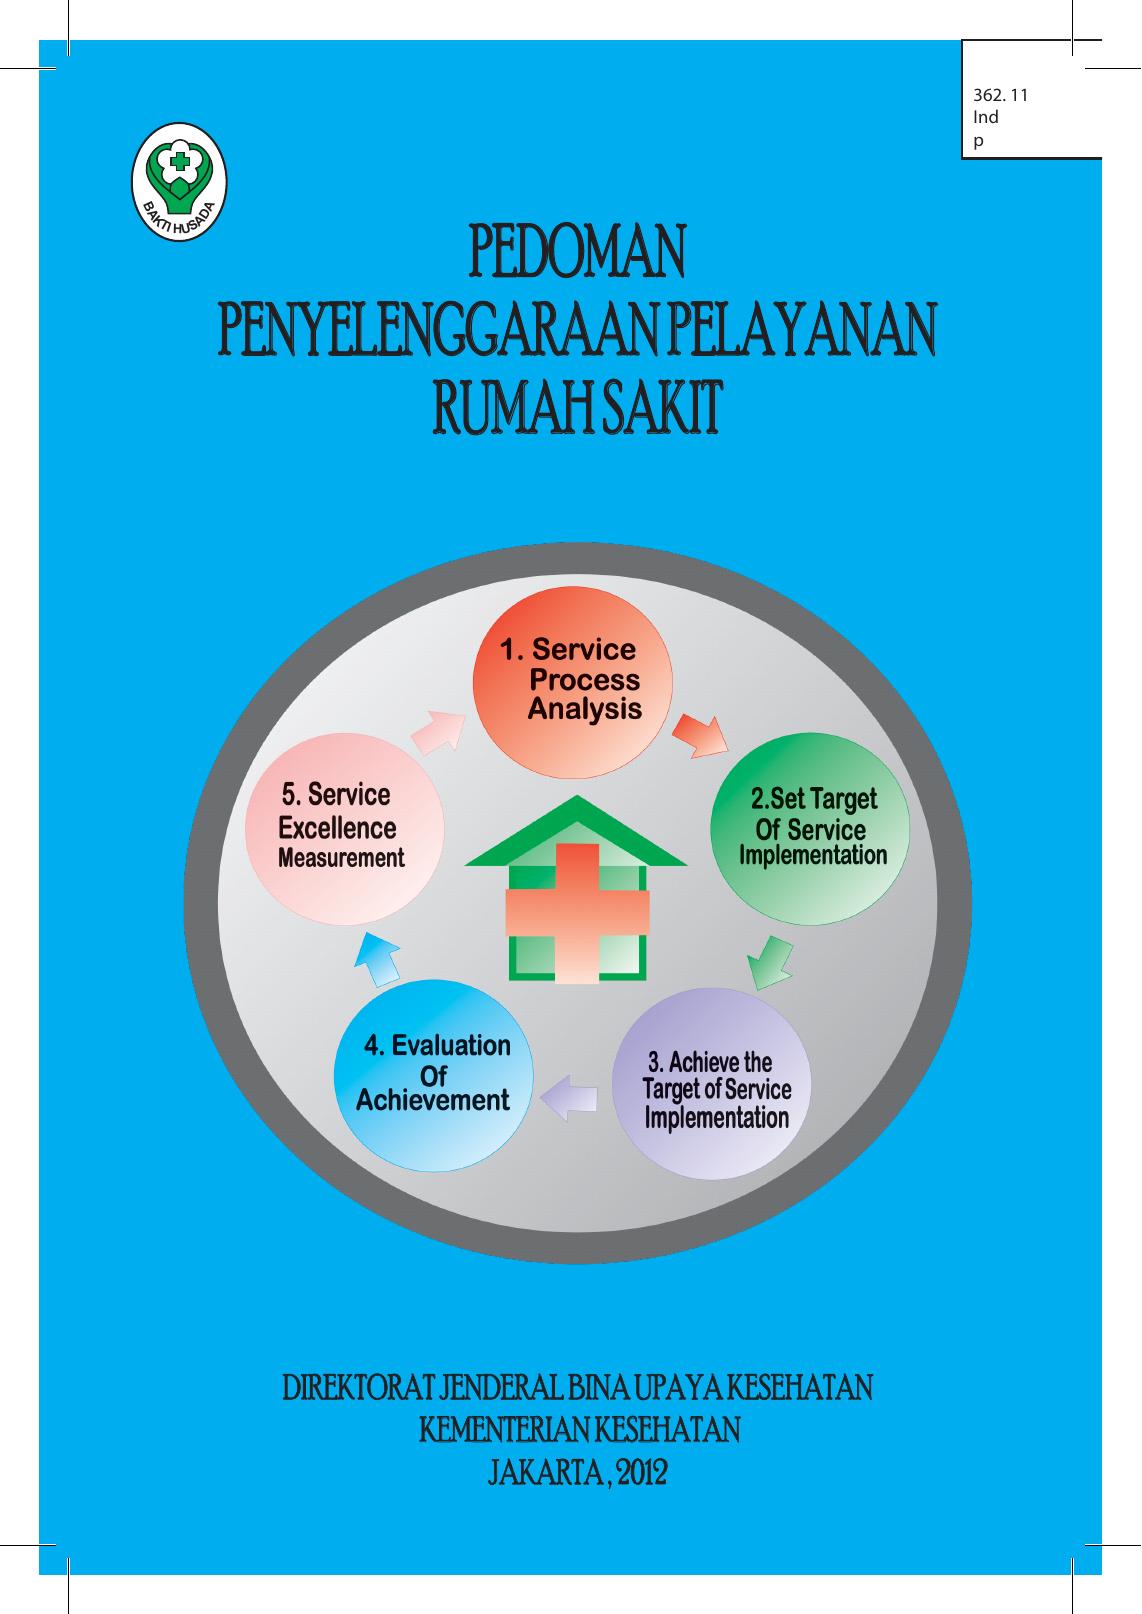 Pedoman Penyelenggaraan Pelayanan Rs 2012 Produk Ukm Bumn Baterai Abc Alkaline Aa